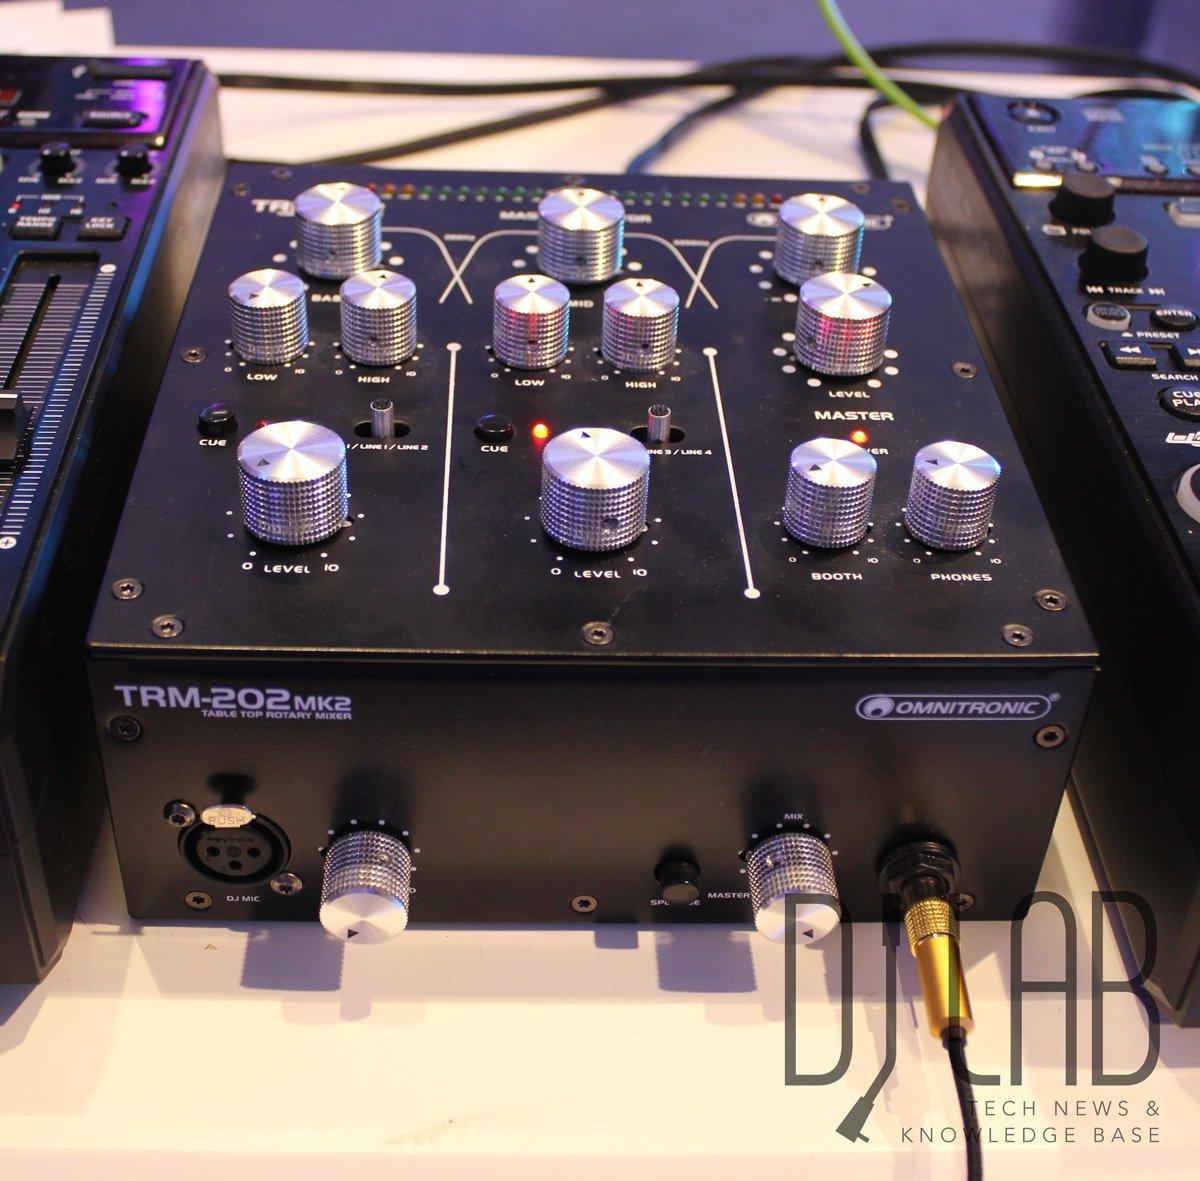 Musikmesse 2016: Omnitronic TRM-202MK2 - Kompakter Rotary-Mixer